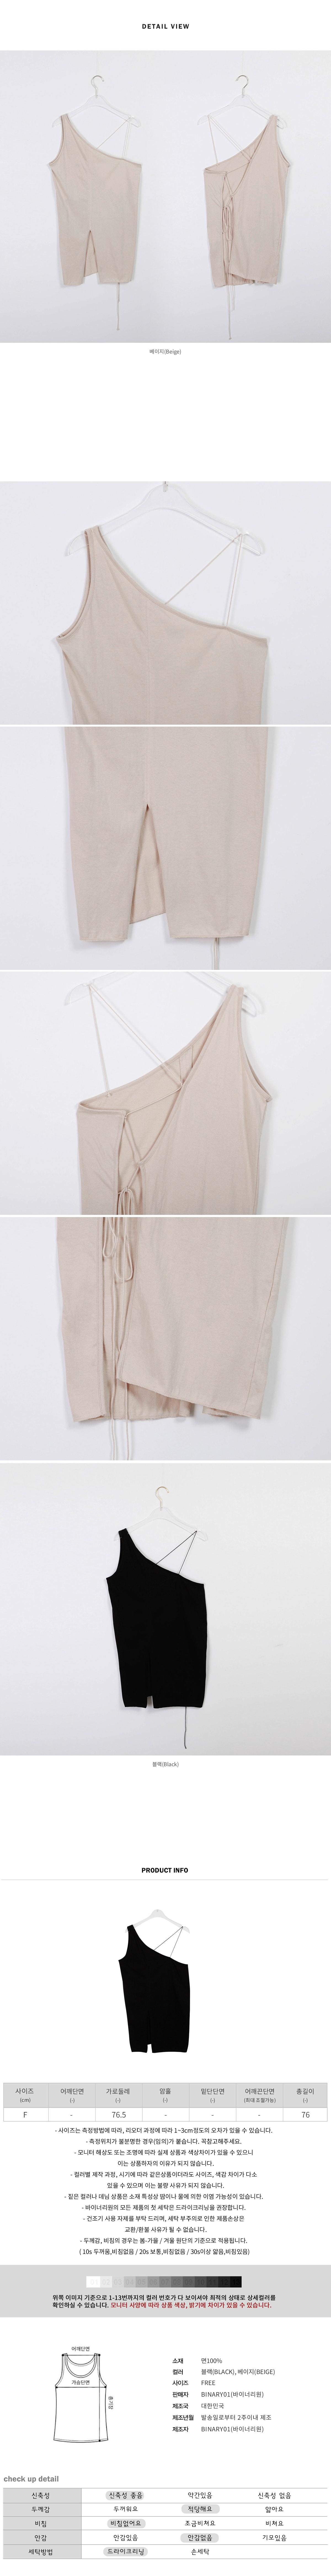 Strap Arthur Sleeveless T-shirt